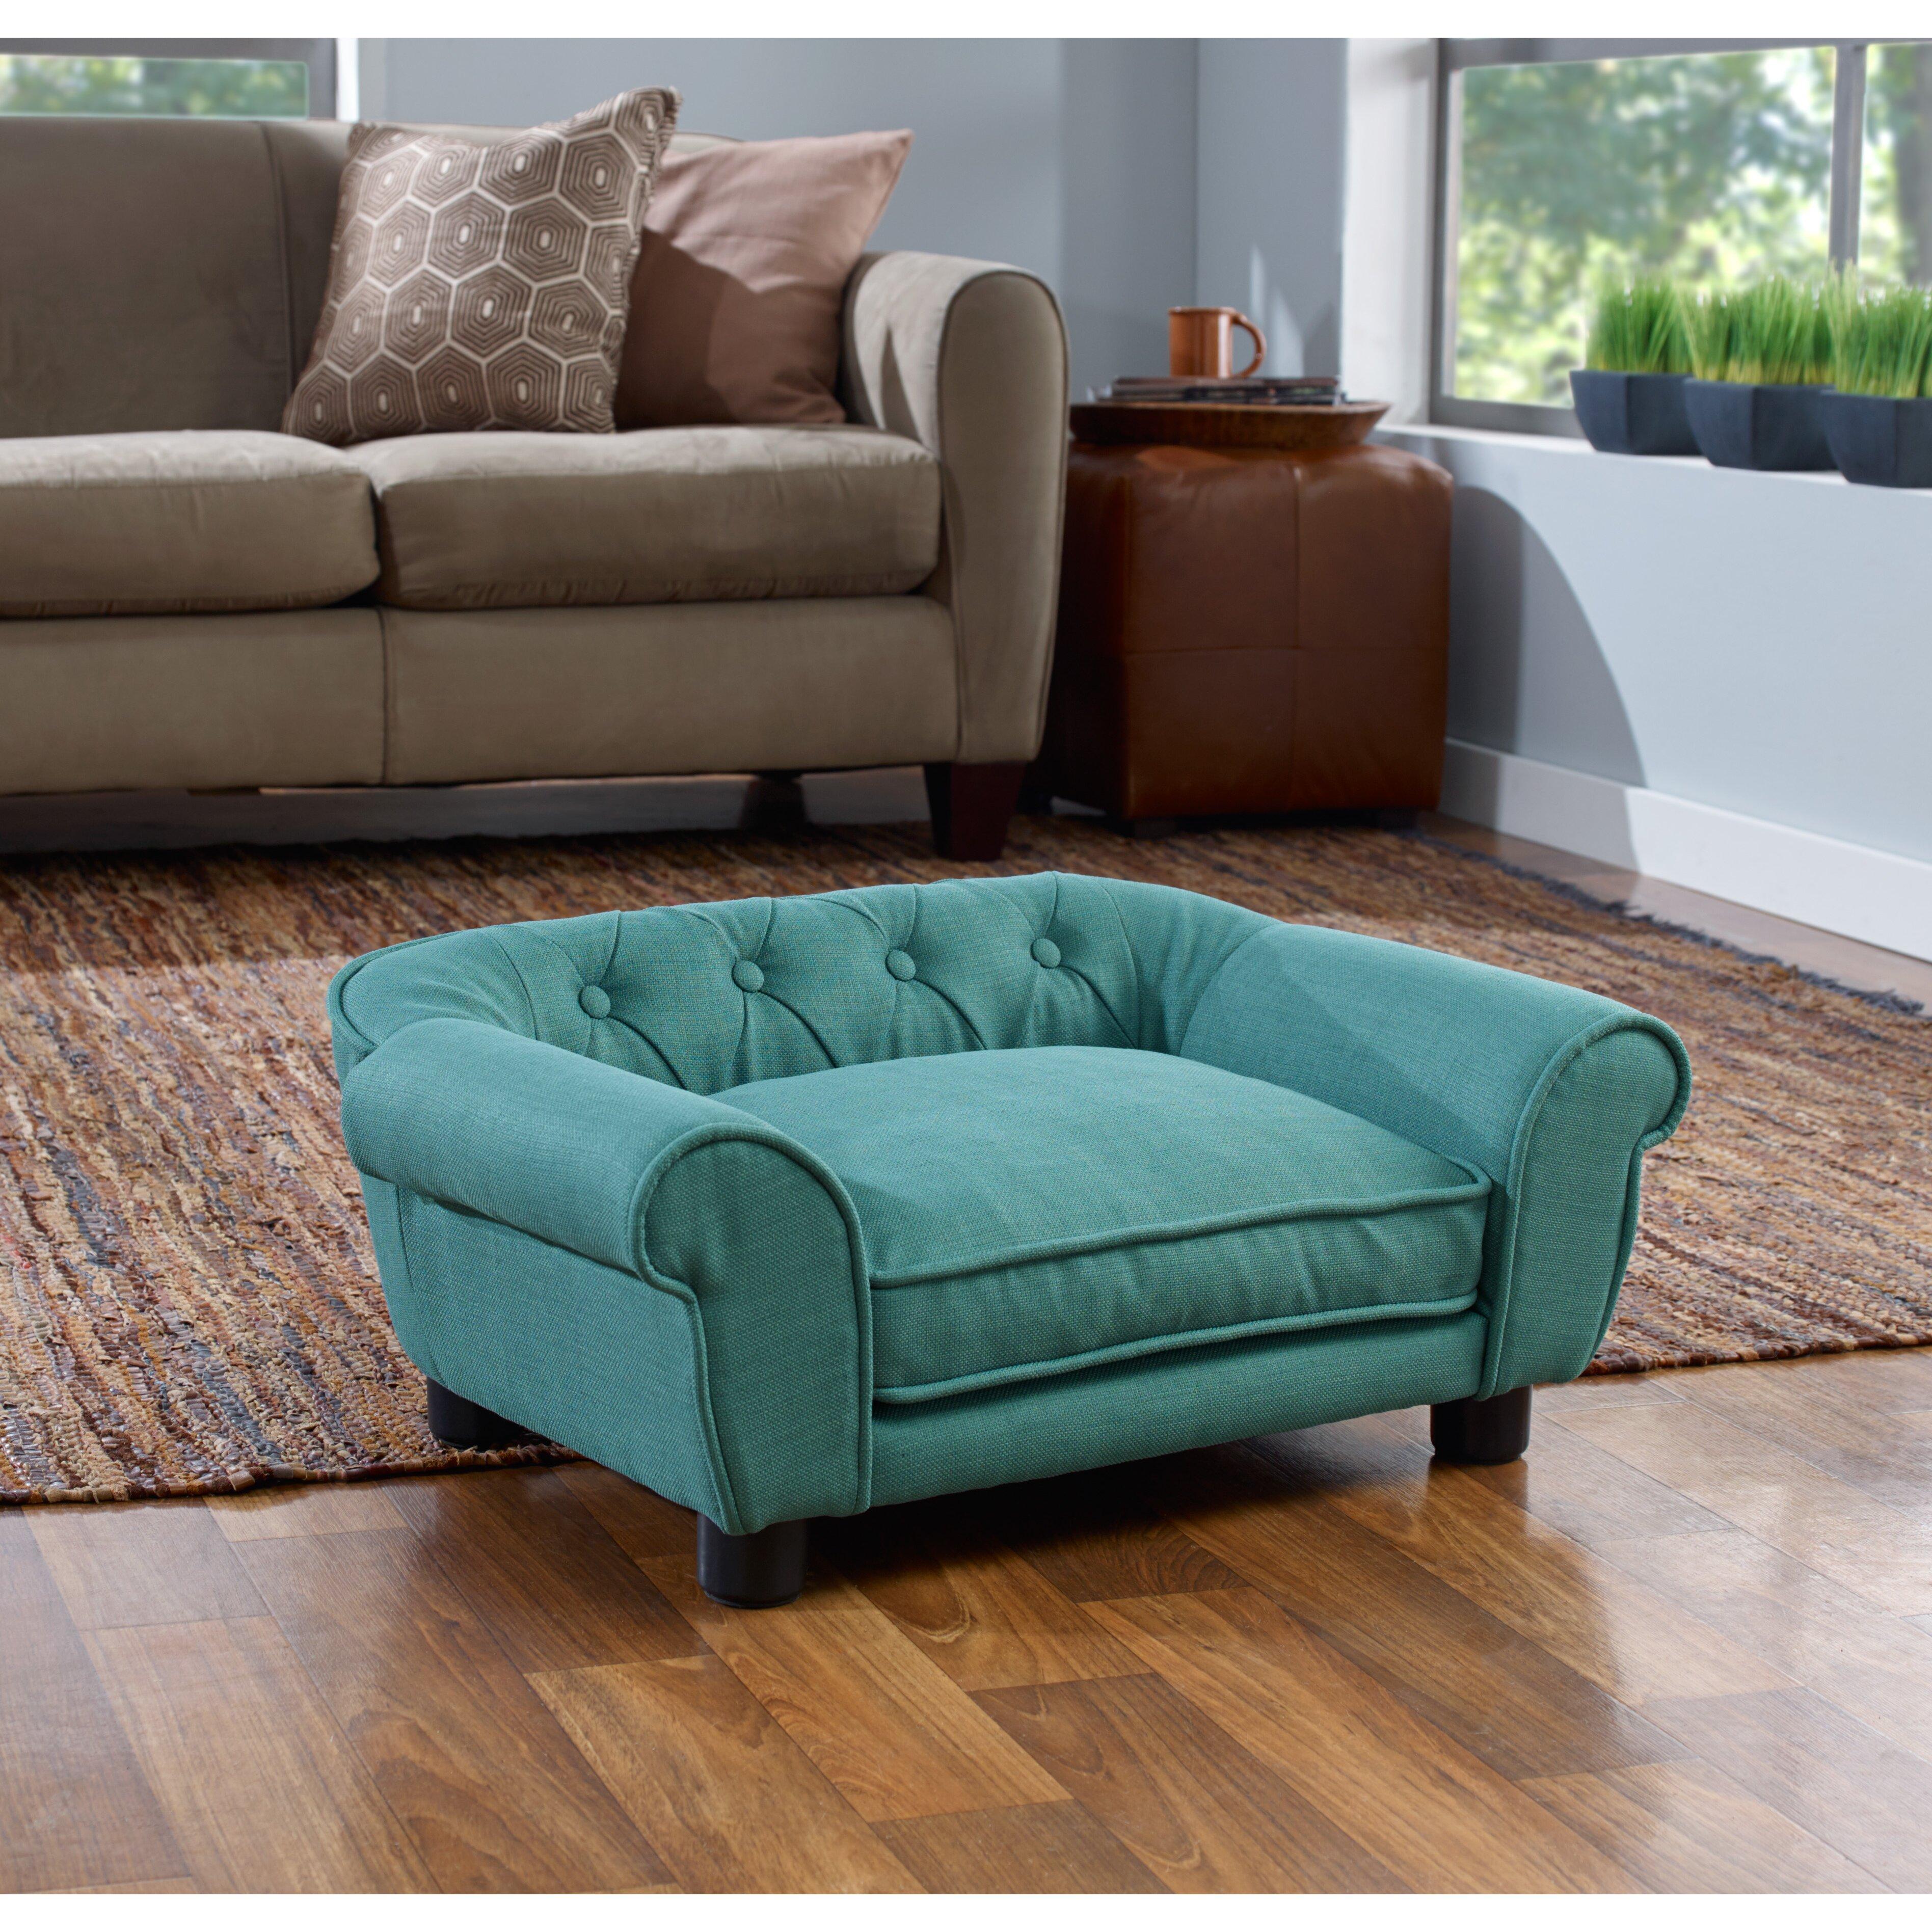 Enchanted Home Pet Sydney Sofa Dog Bed Amp Reviews Wayfair